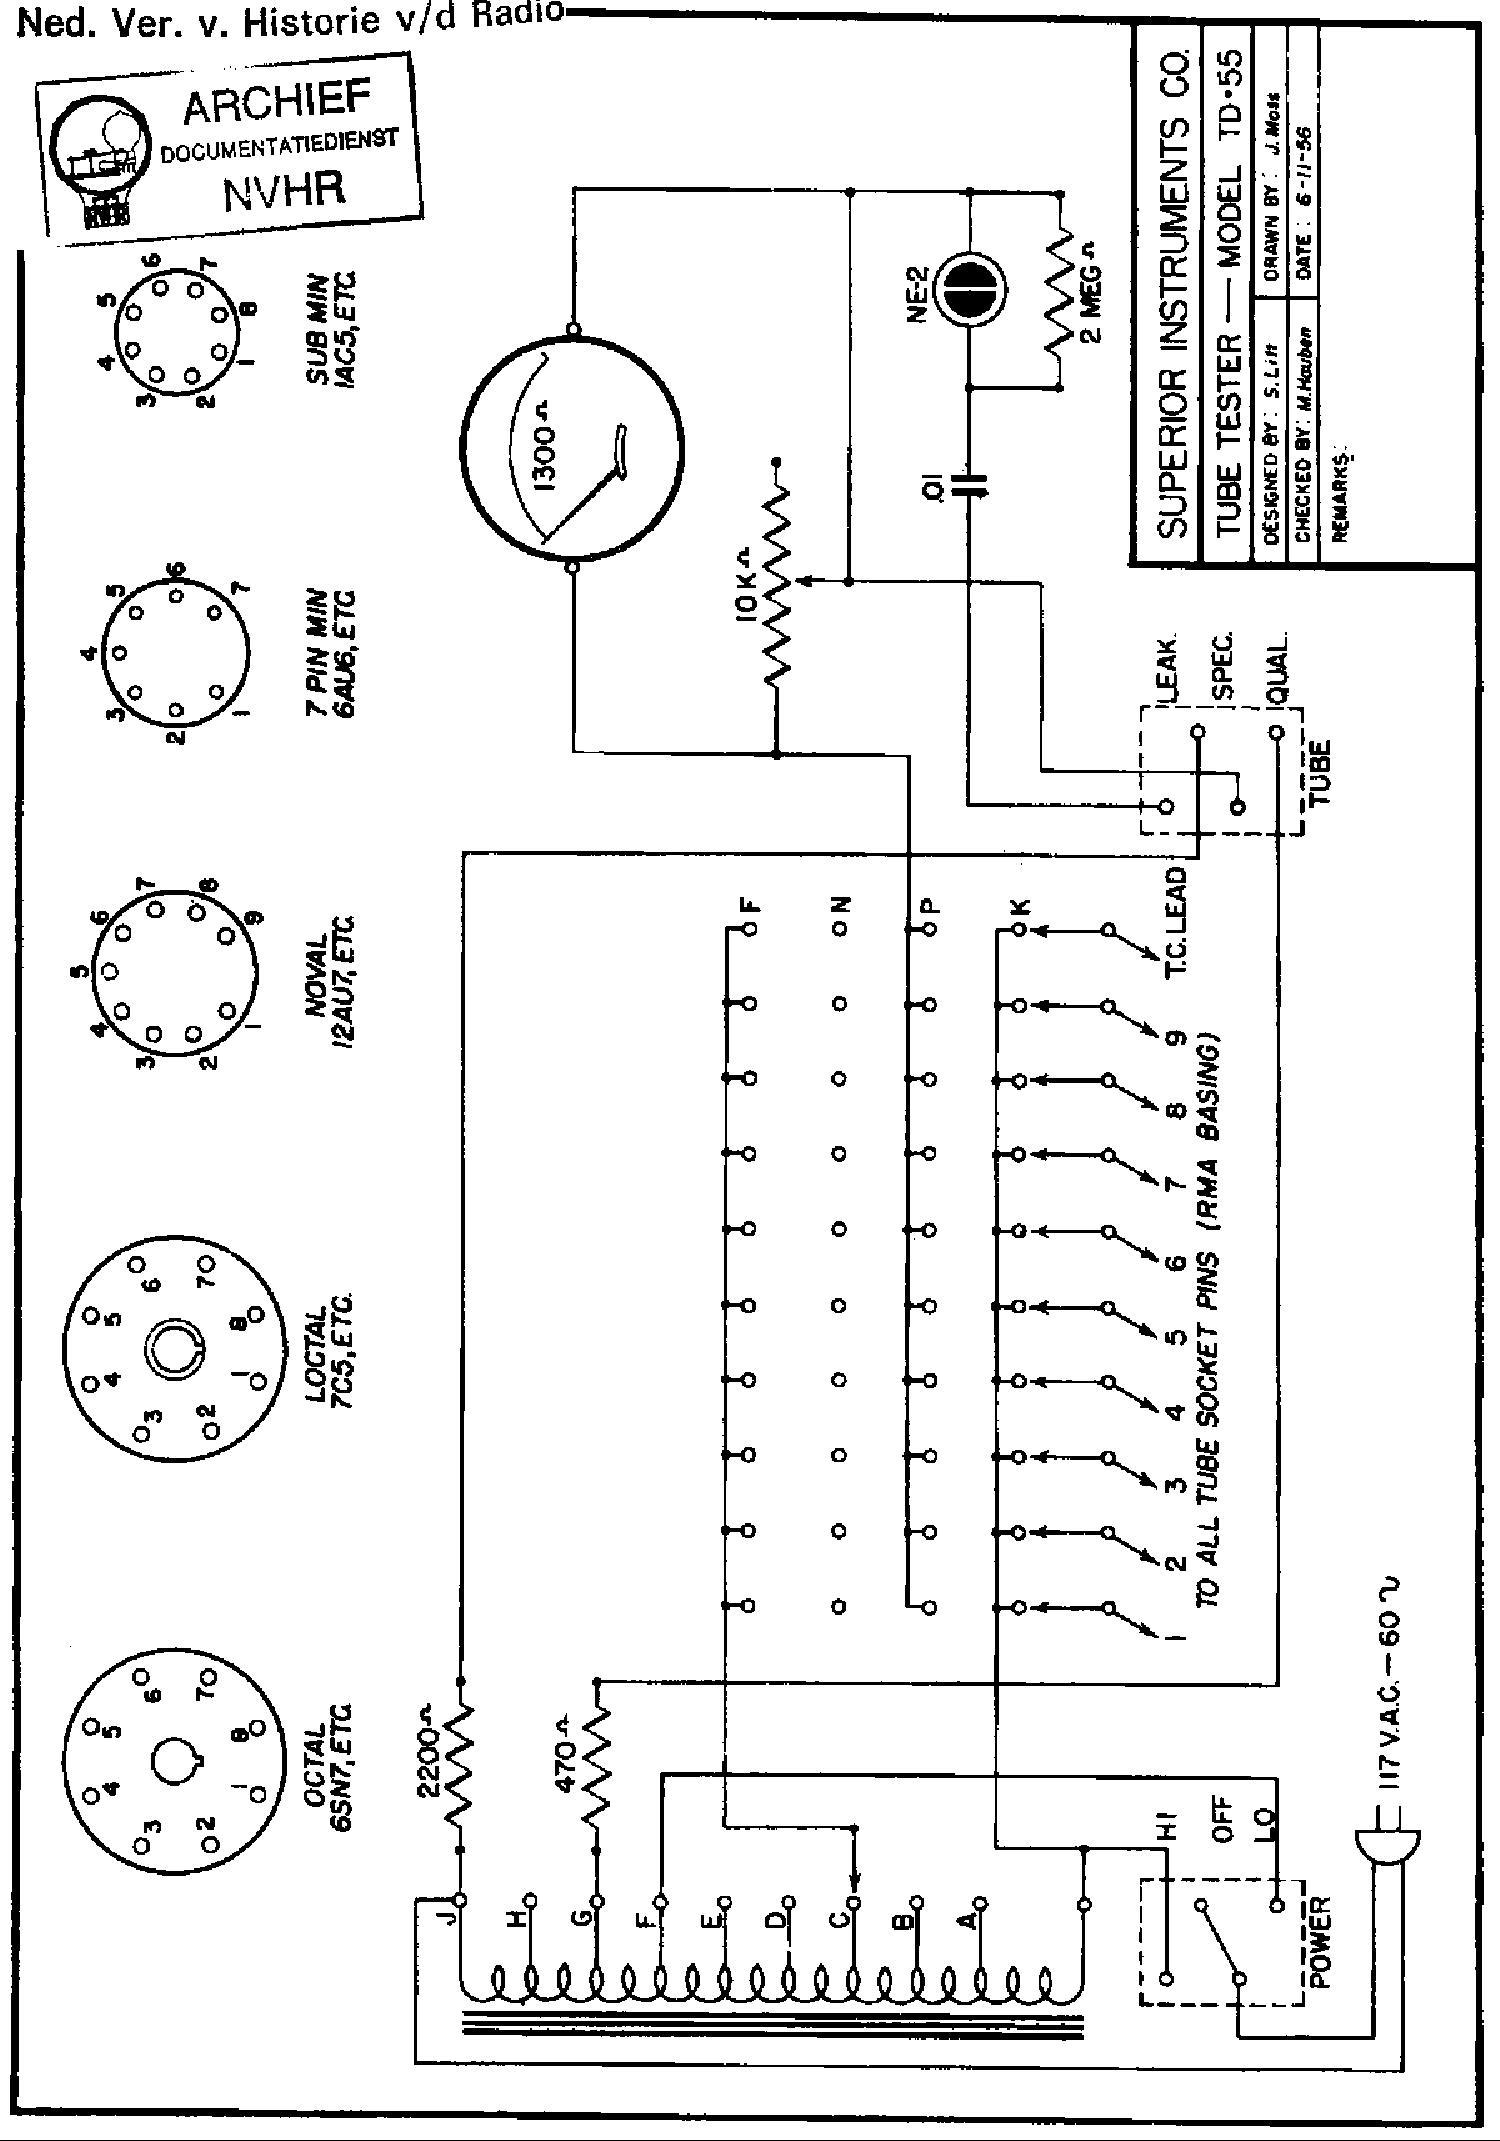 superiorinstruments td55 tube tester 1956 sch service